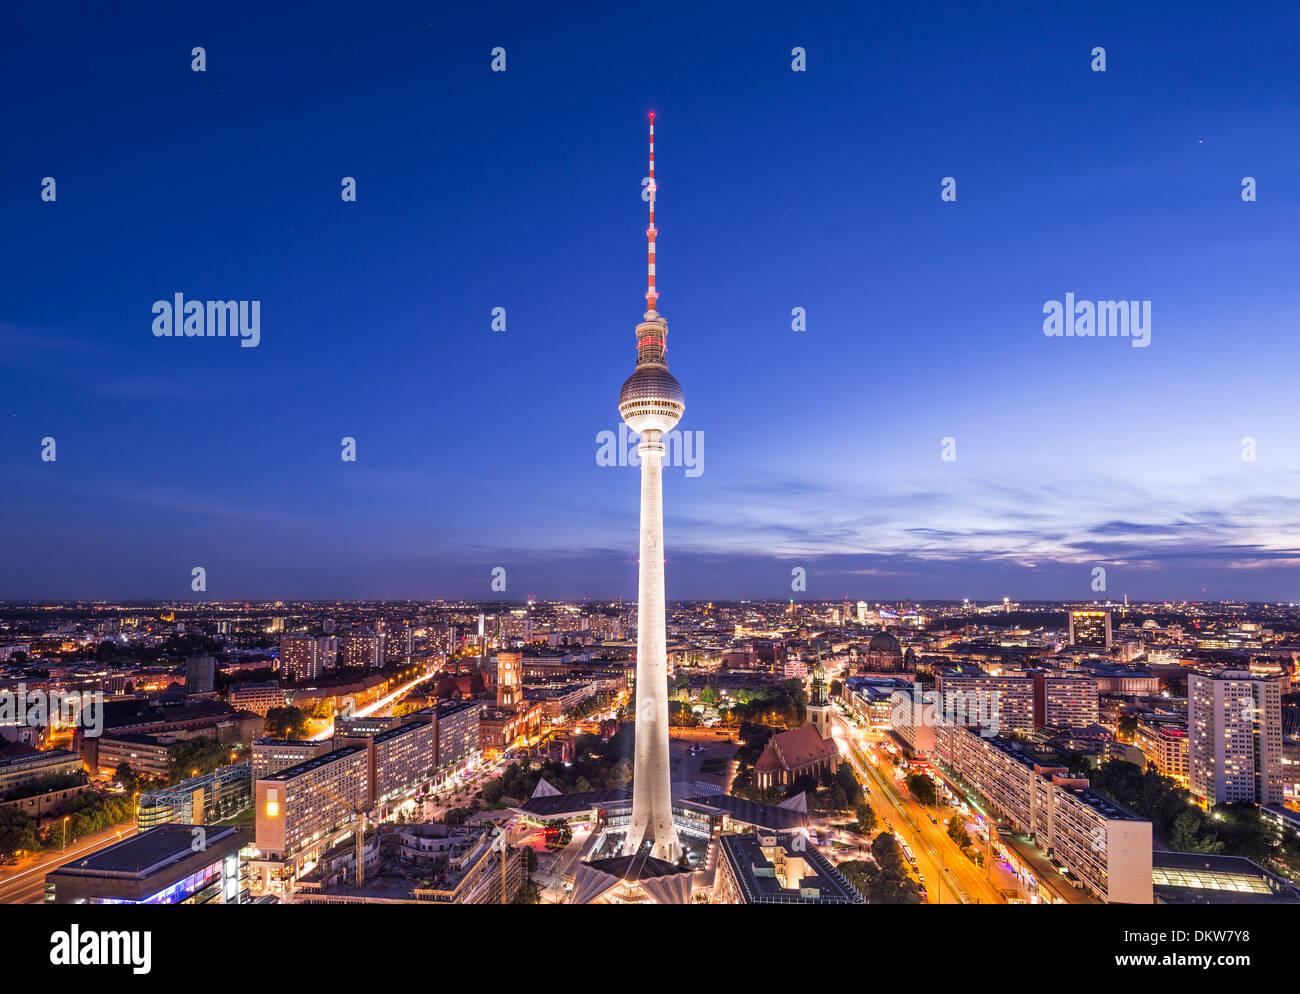 Paysage urbain de Berlin, Allemagne, à l'Alexanderplatz. Photo Stock